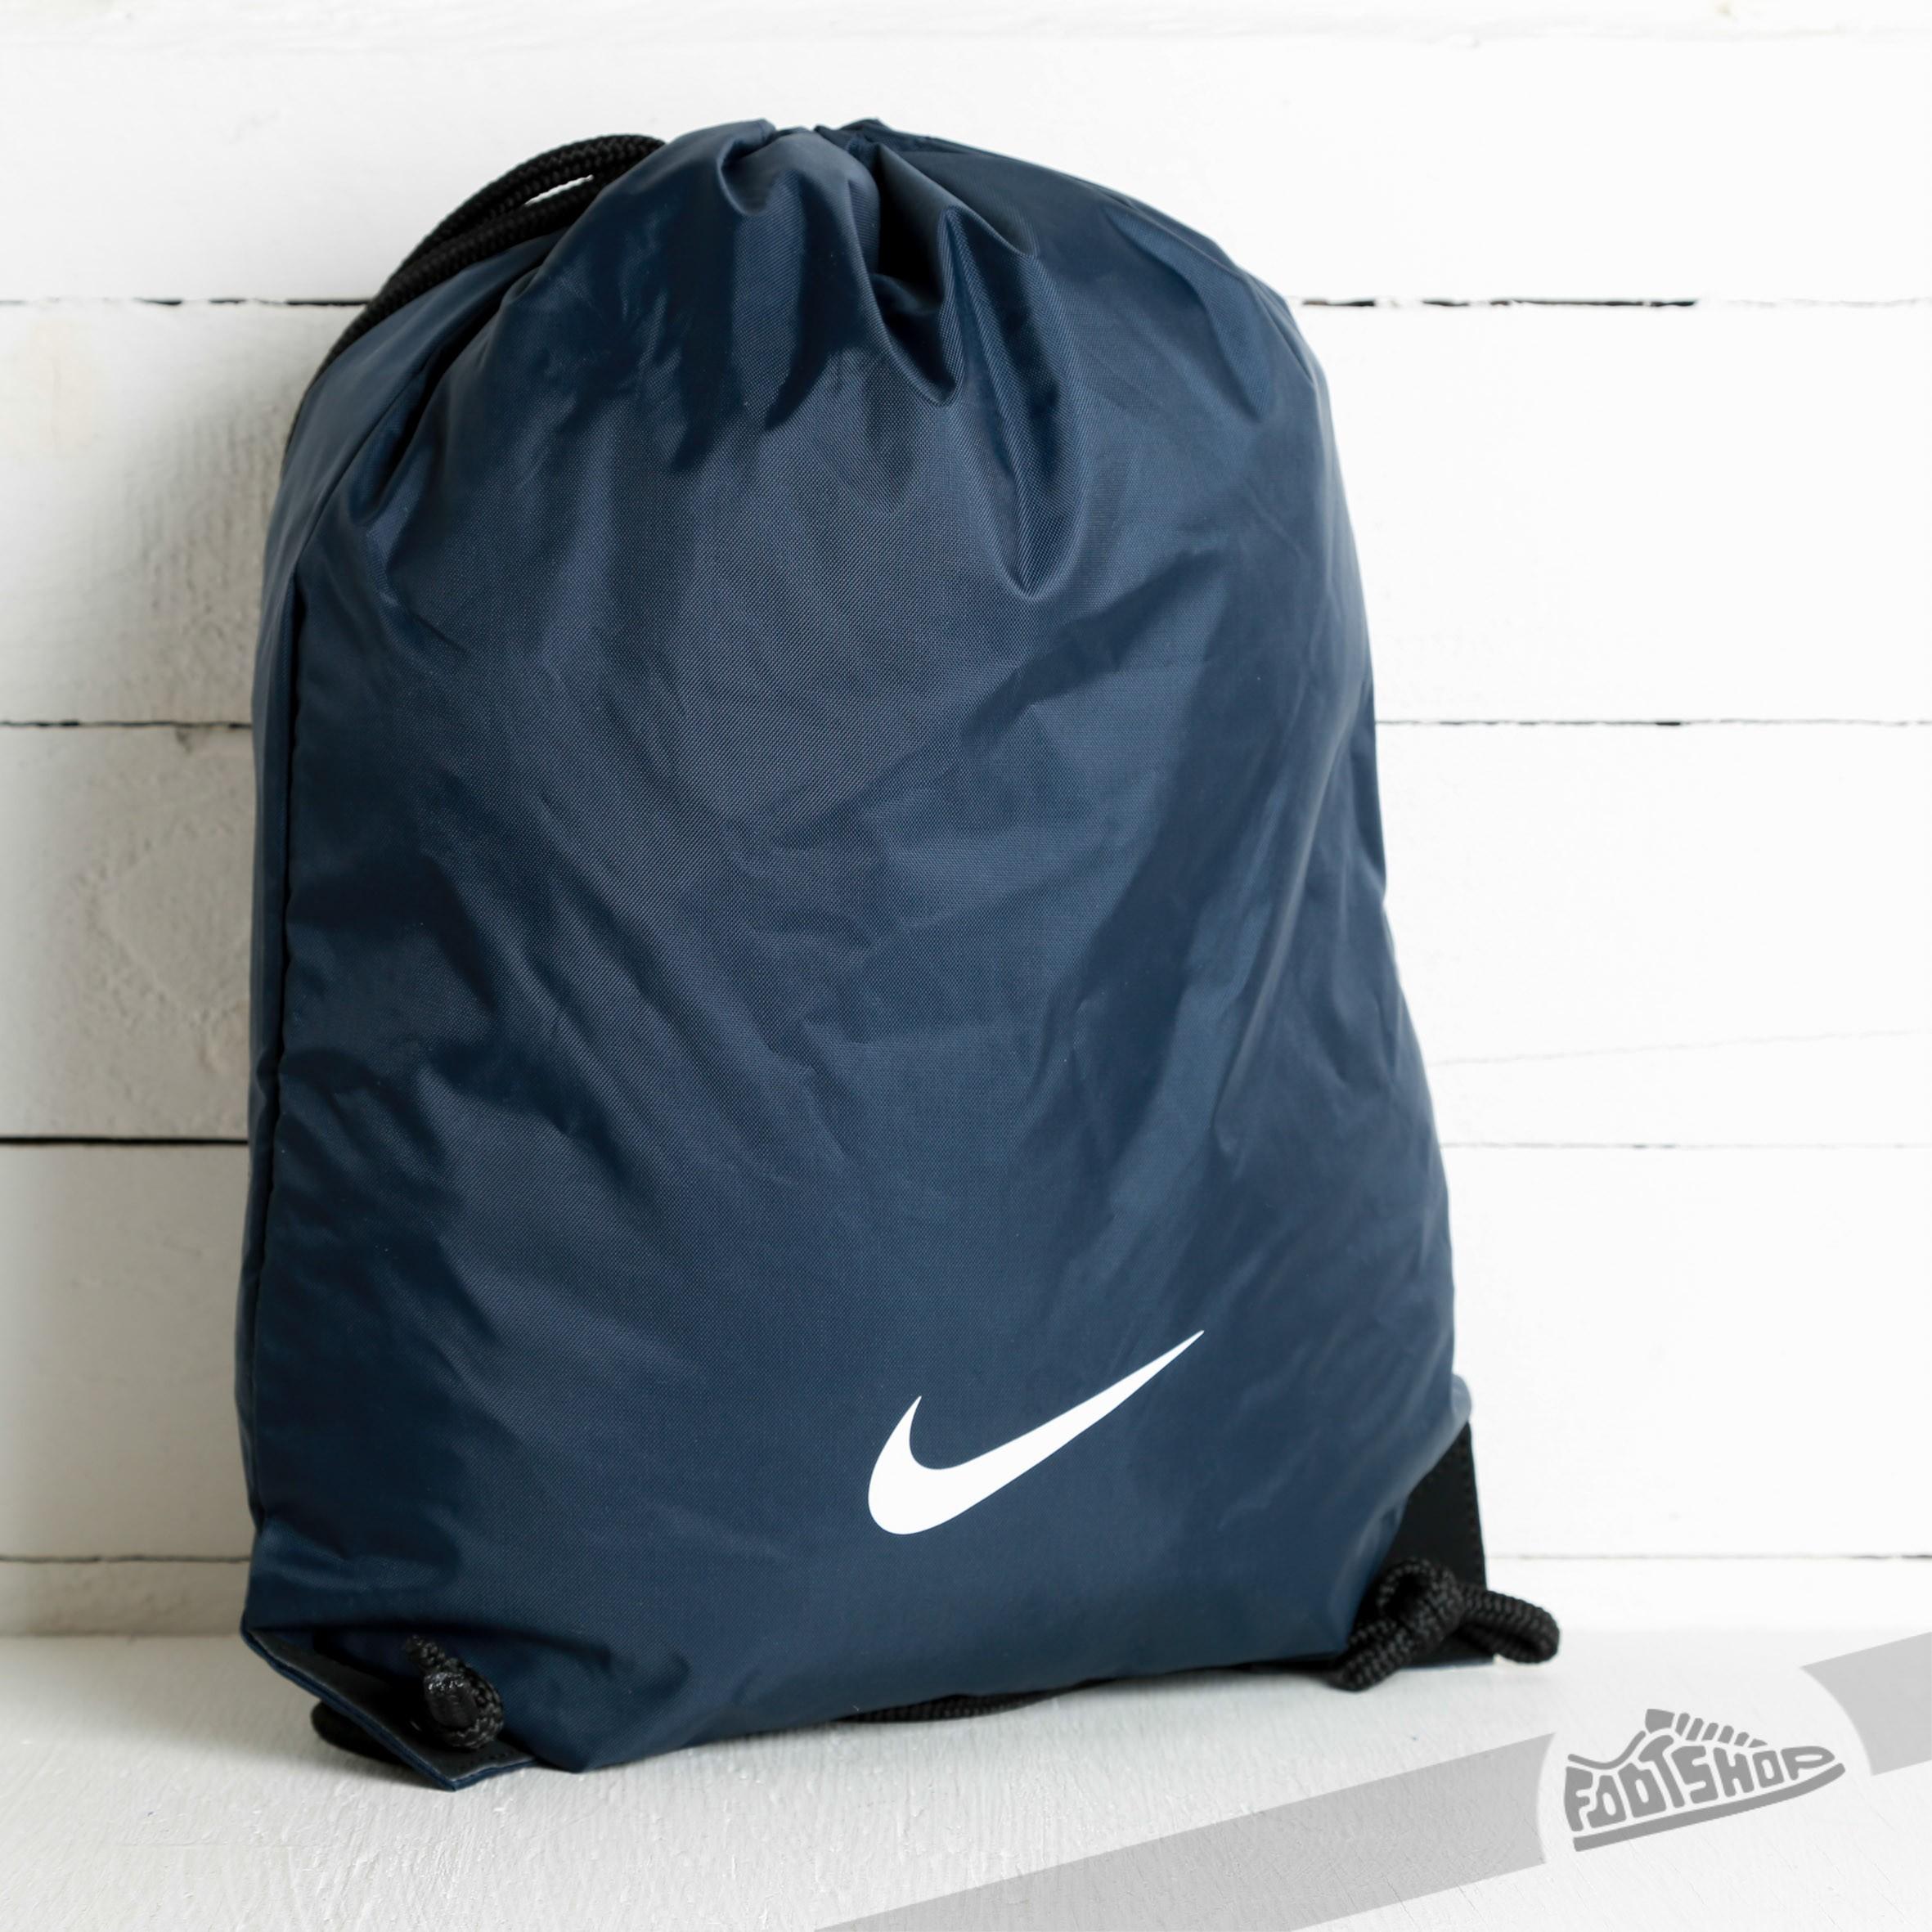 0ed98eea1d Nike Fundamental Swoosh Gymsack Navy